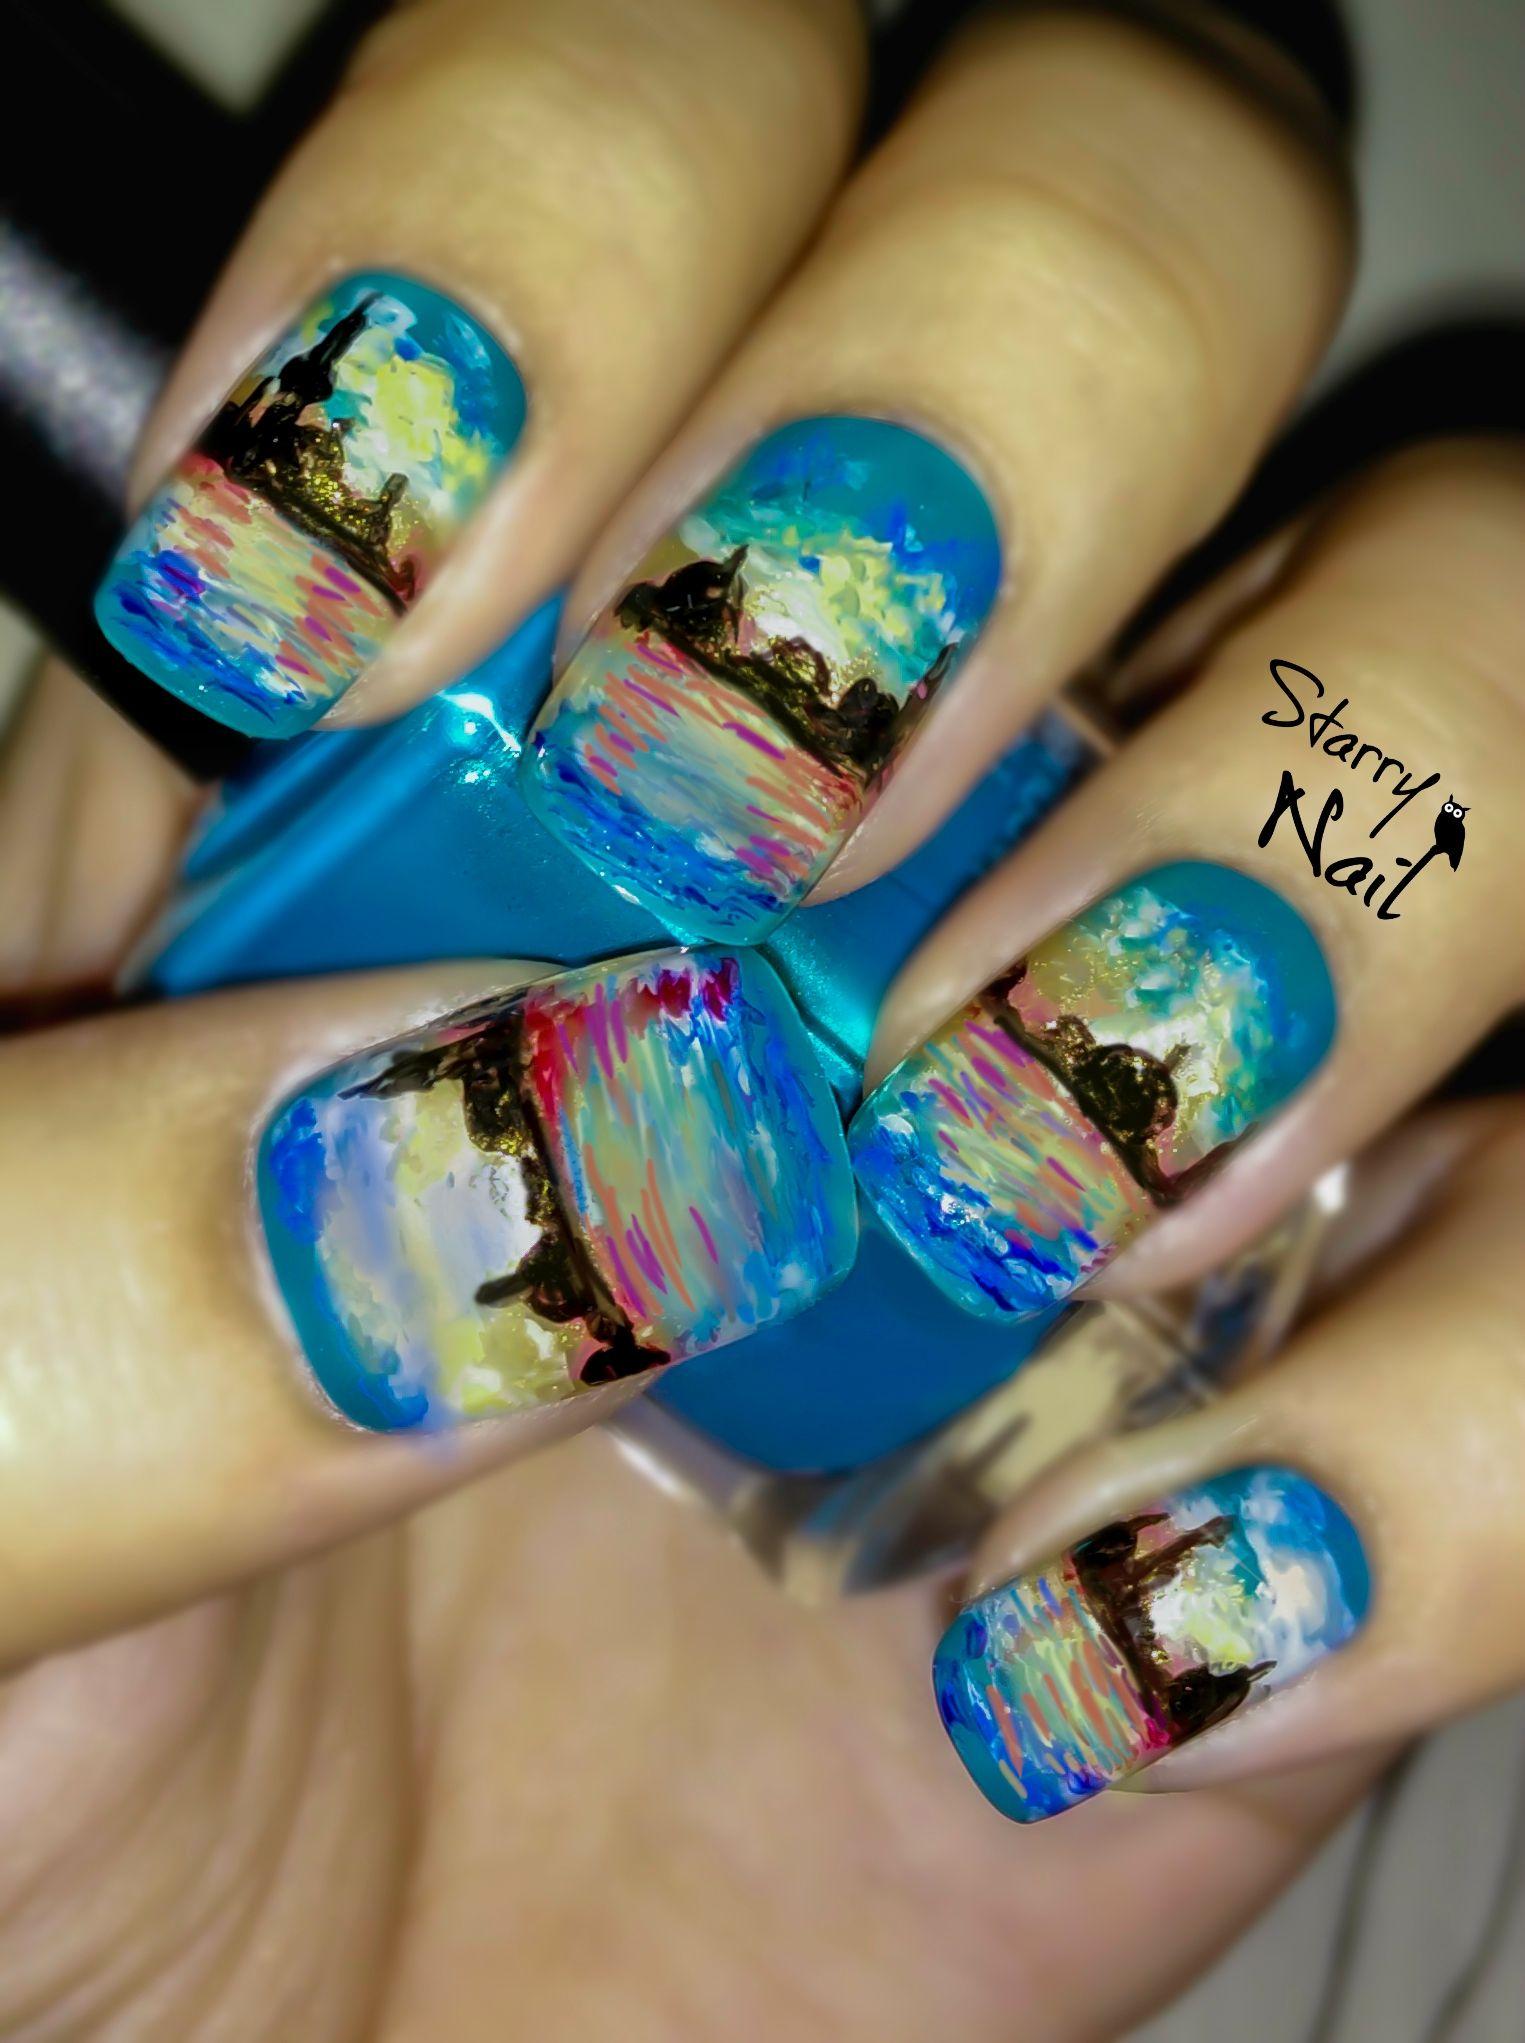 Monets venice twilight nail art nail art pinterest crazy monets venice twilight nail art prinsesfo Gallery